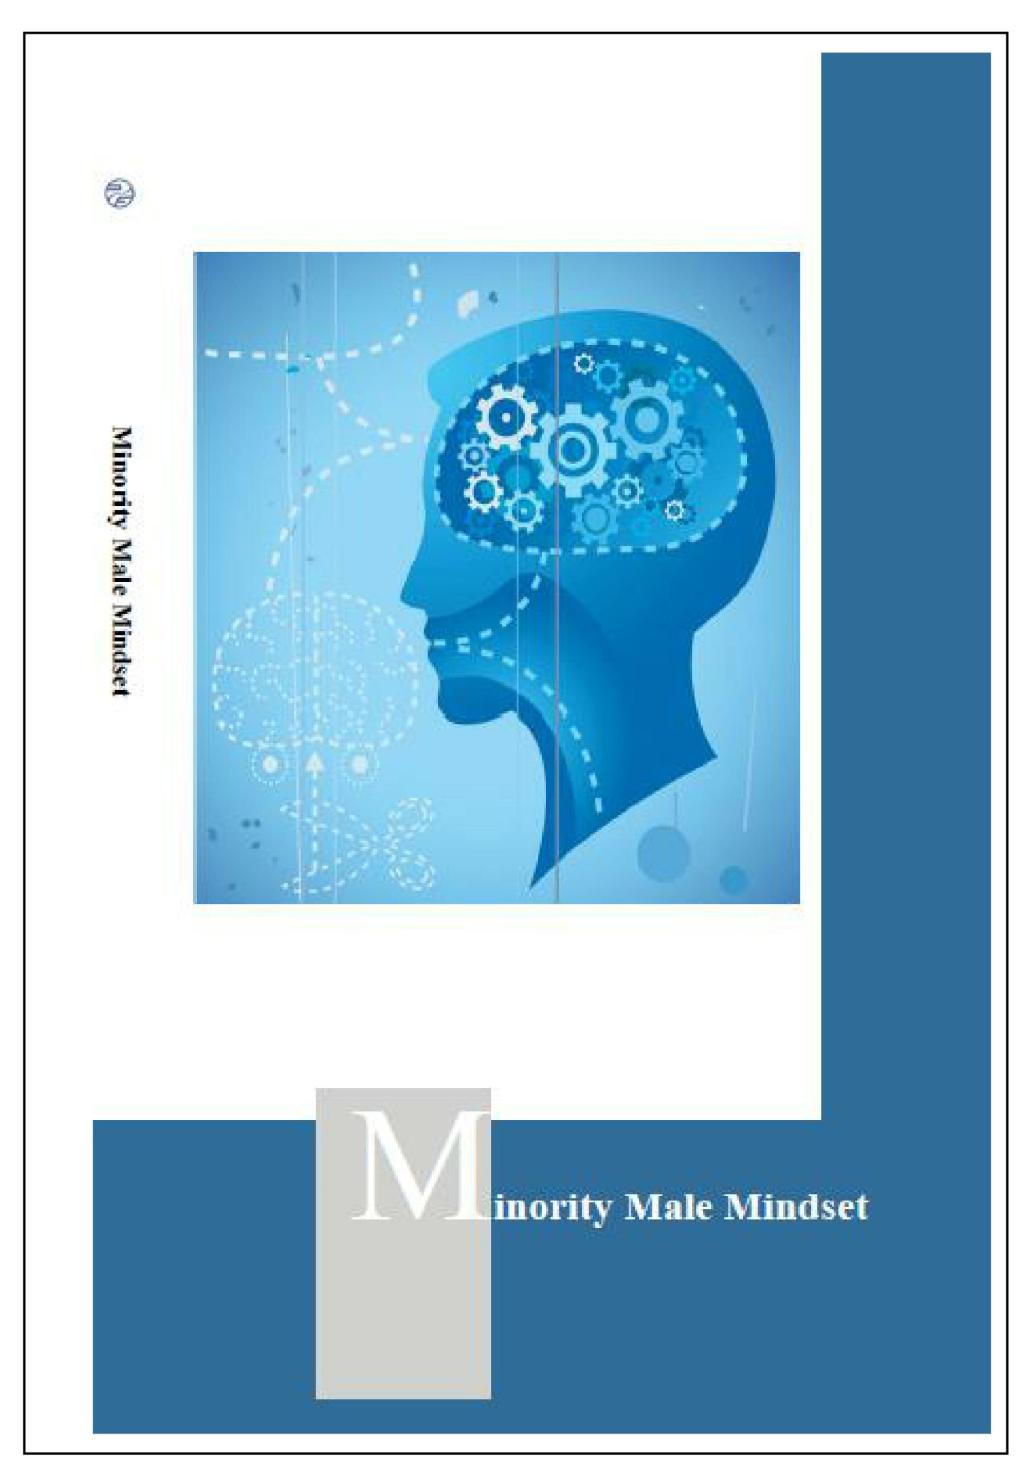 Minority Male Mindset Cover Half 2012